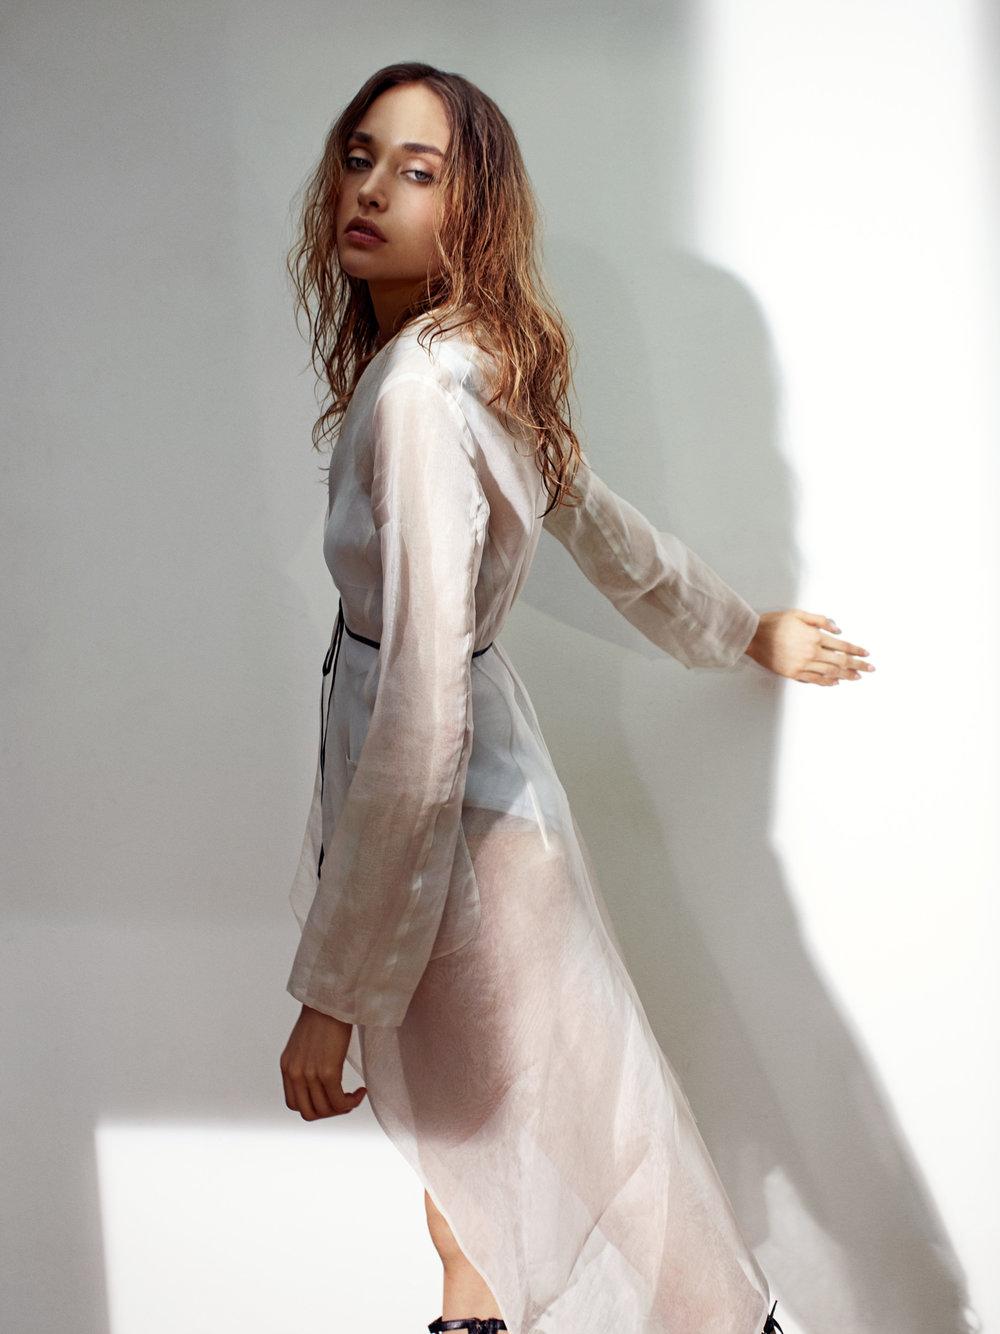 Jack_Eames_Fashion_Shot_04.jpg